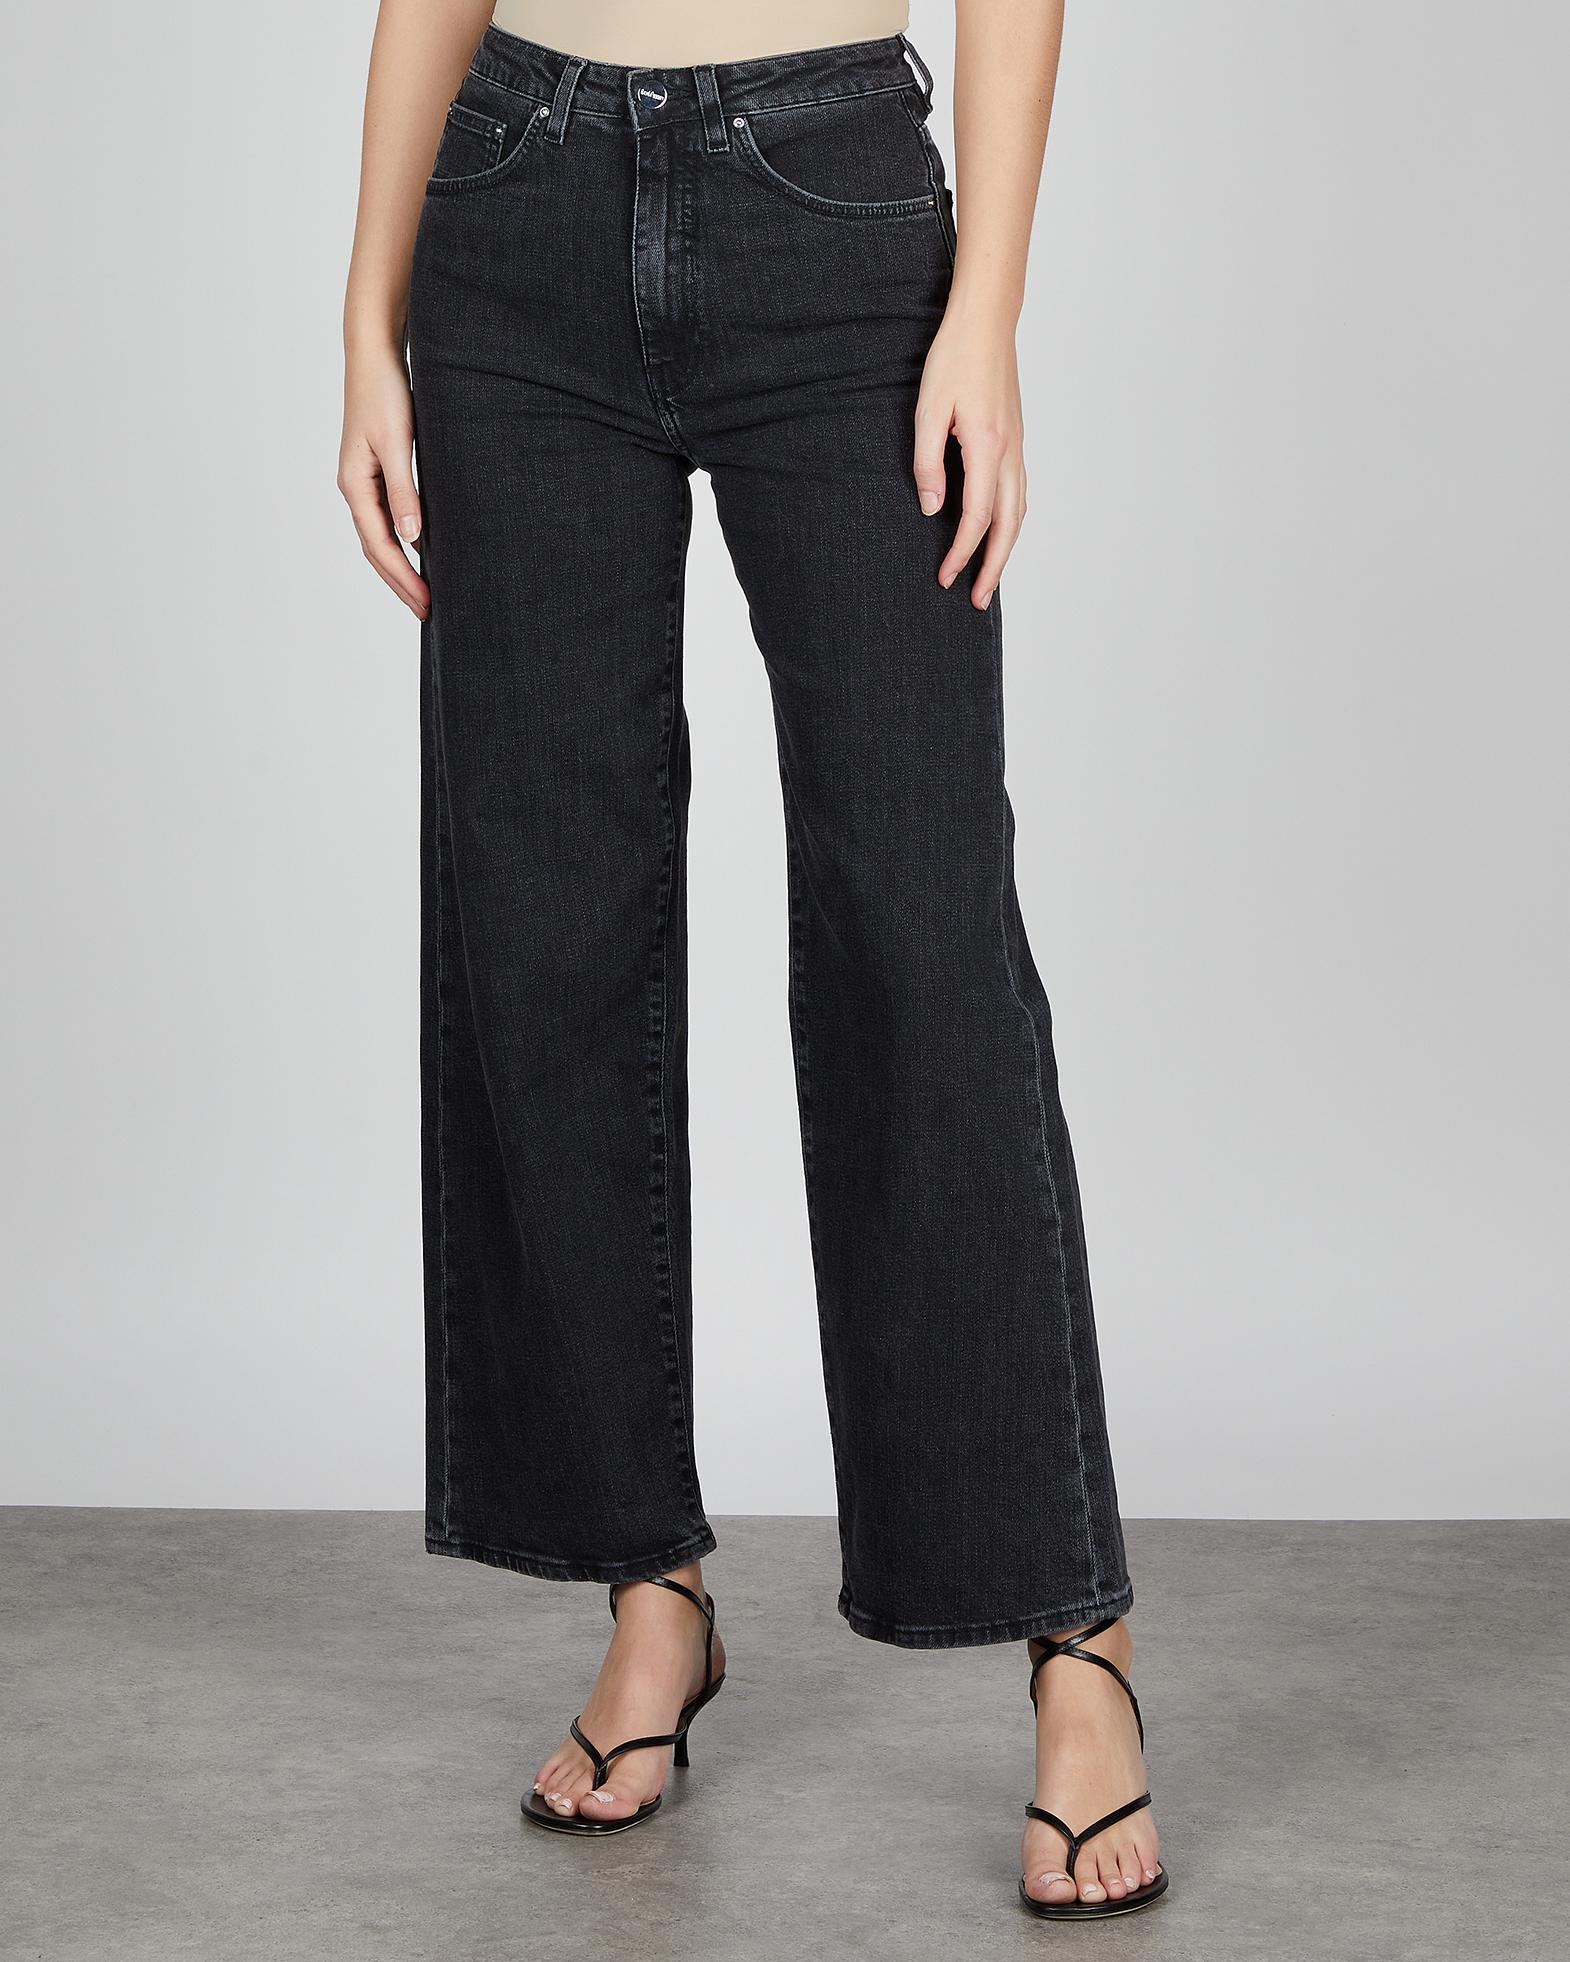 Totême Jeans Flare Fit Denim grey 23/32